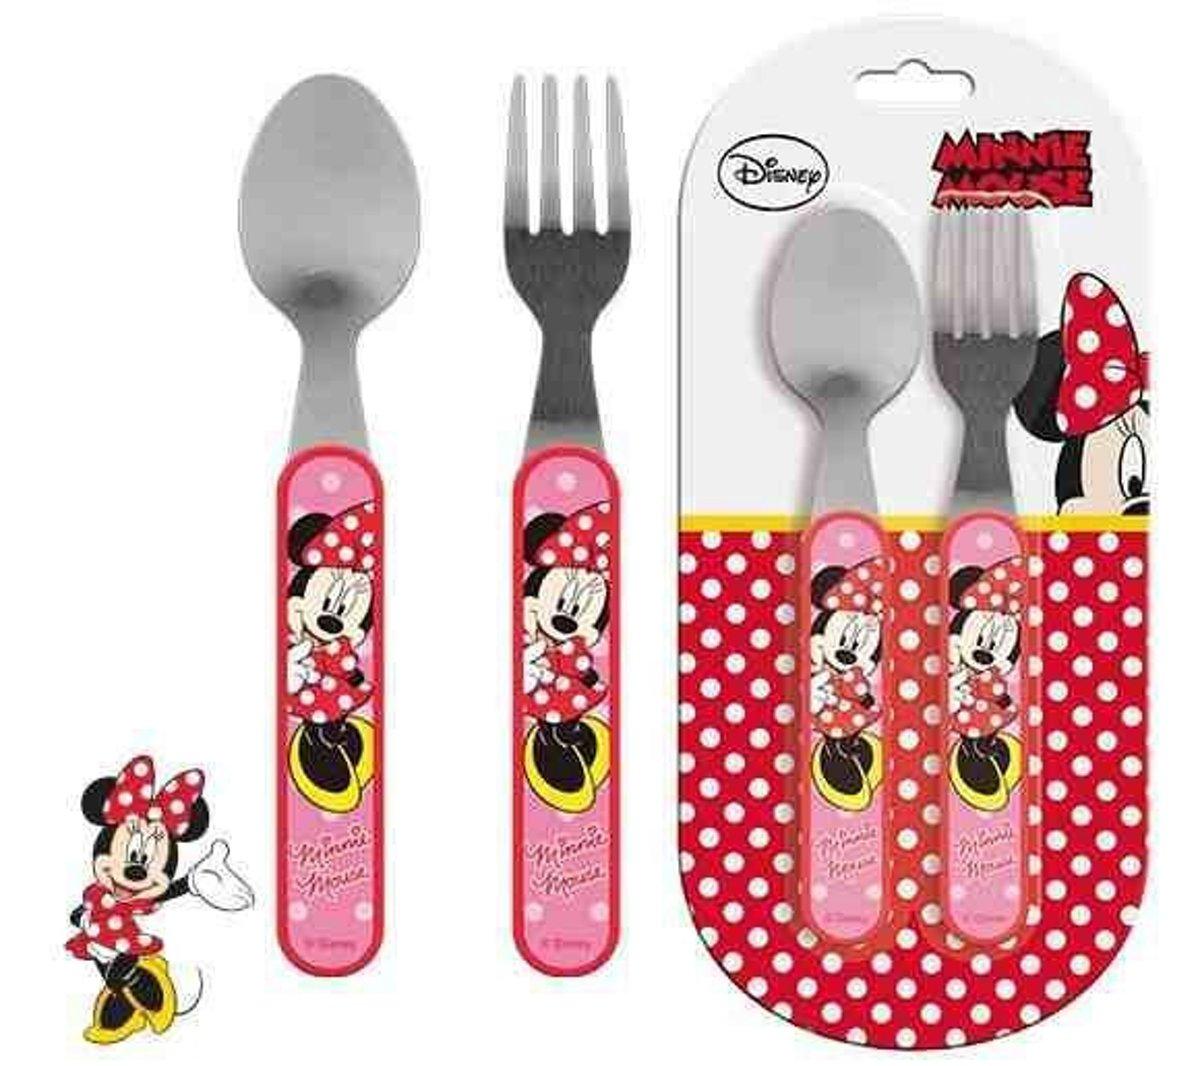 Bestek set Minnie Mouse Lepel en Vork